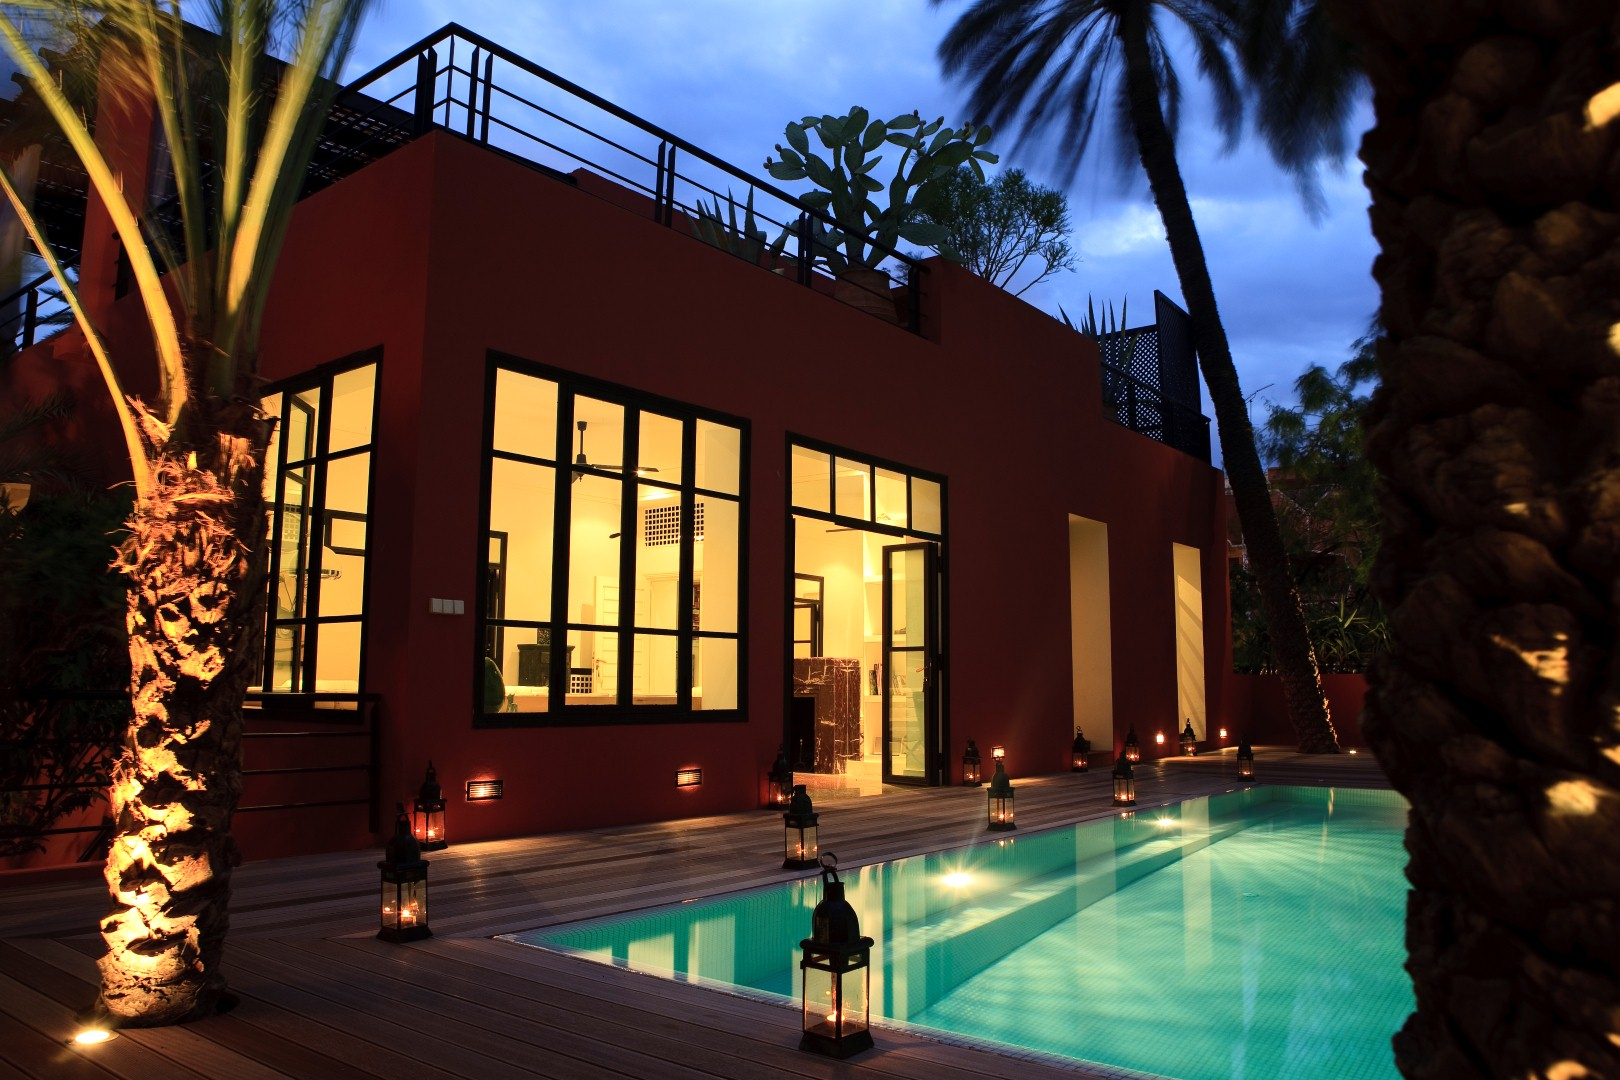 A louer en exclusivit marrakech 10 villas avec piscine for Villa marrakech piscine